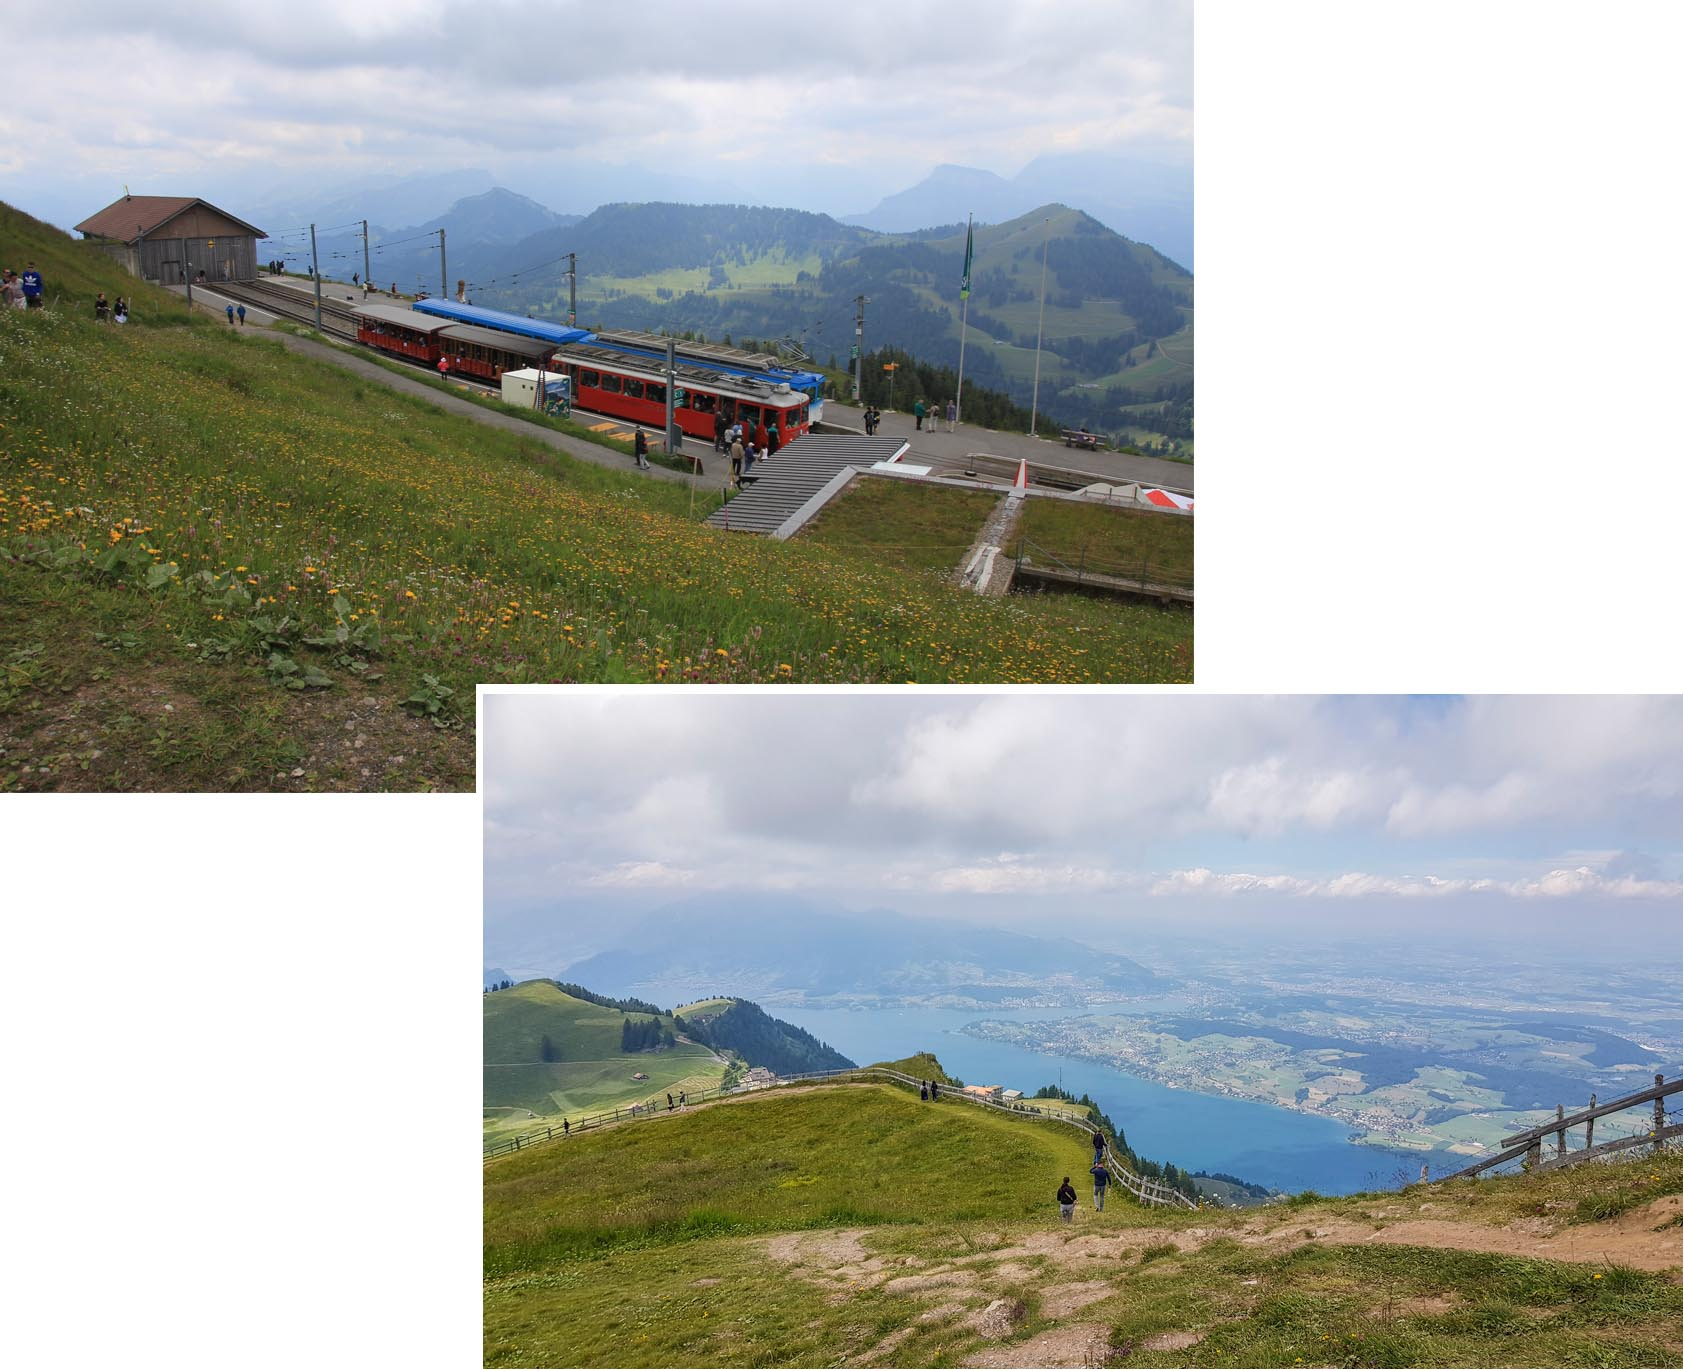 Rigi Klum station (Rigi Klumweg) and Lake Lucerne